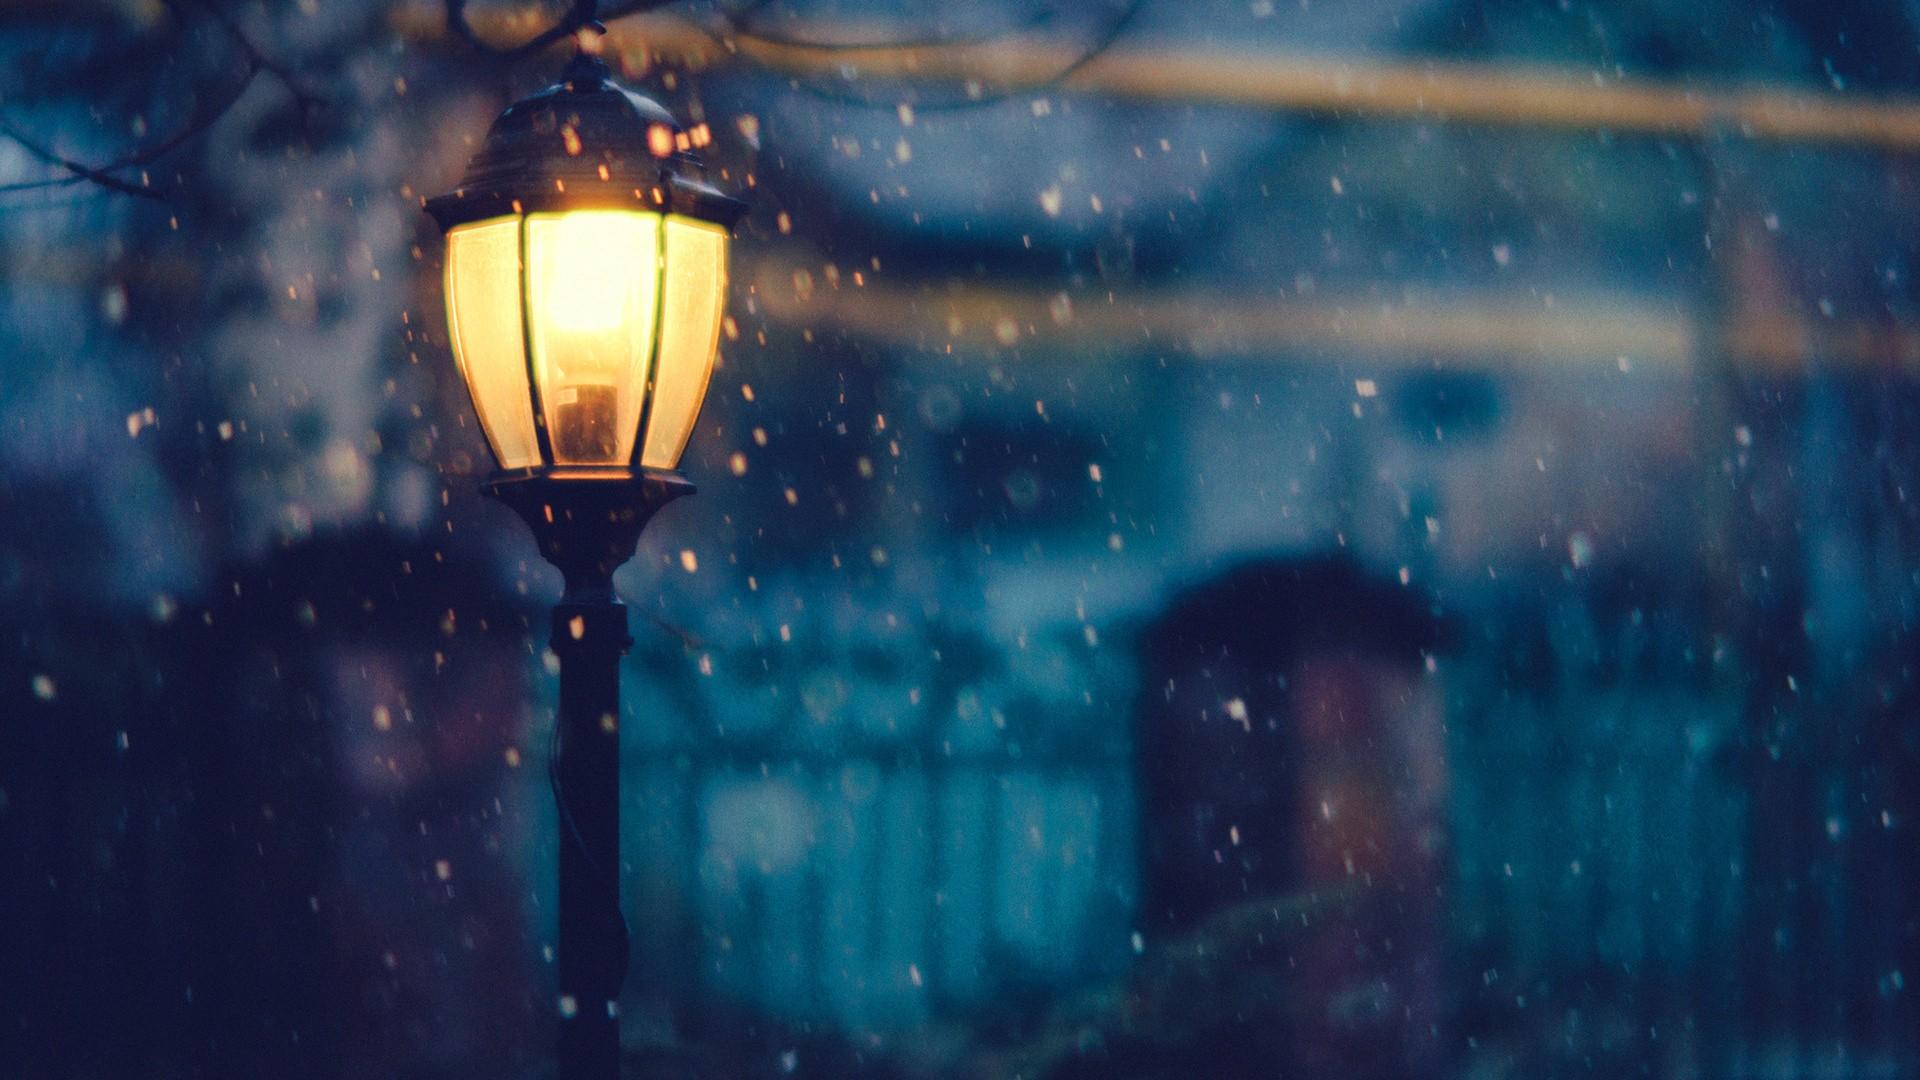 Sunlight Street Light Night Urban Reflection Snow Winter Lantern Blue Blurred Atmosphere Snowflakes Emotion Lighting